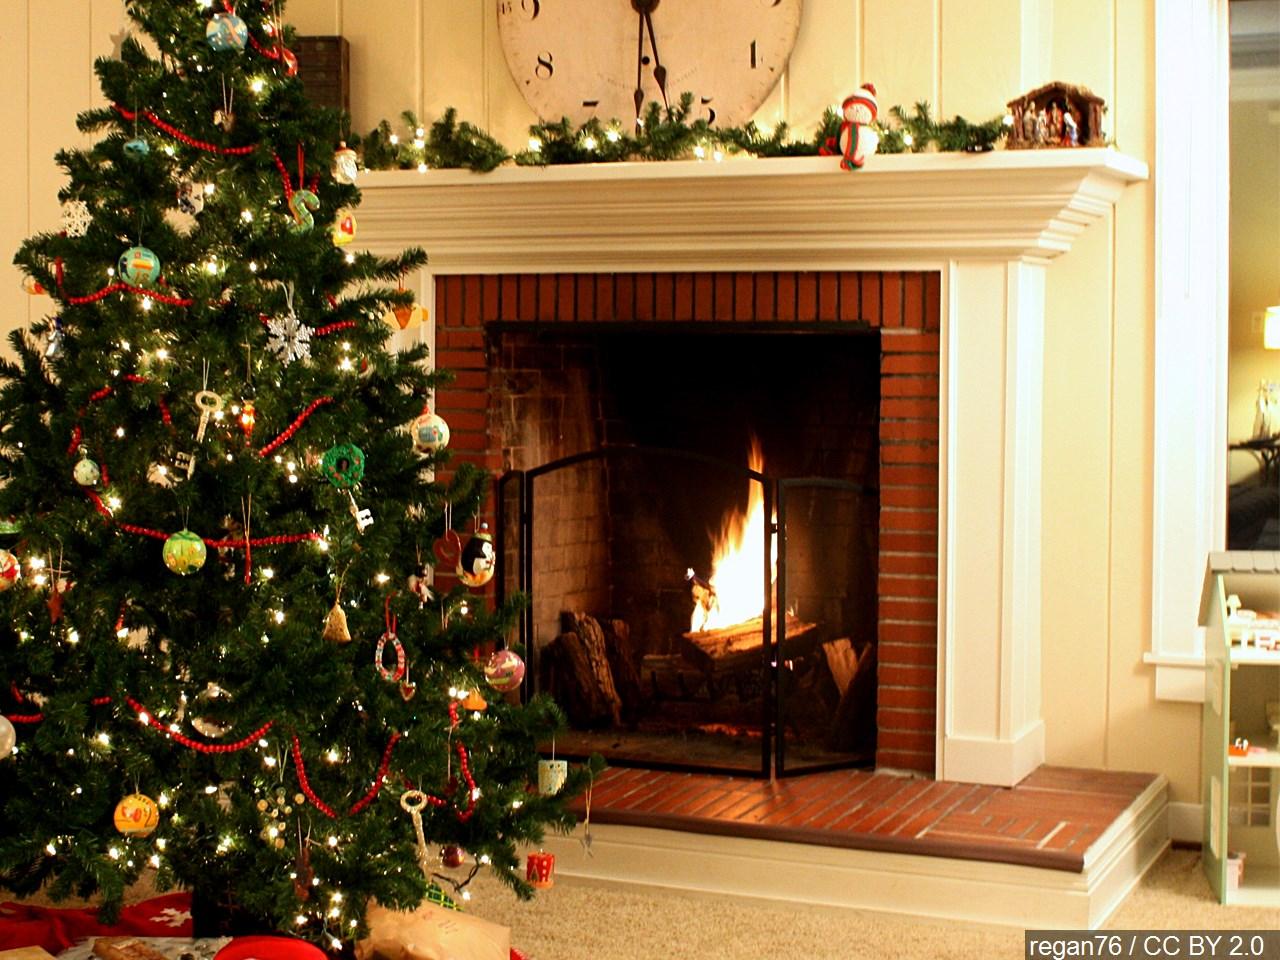 Siriusxm Christmas Music.Siriusxm Holiday Music Season Starts Nov 1